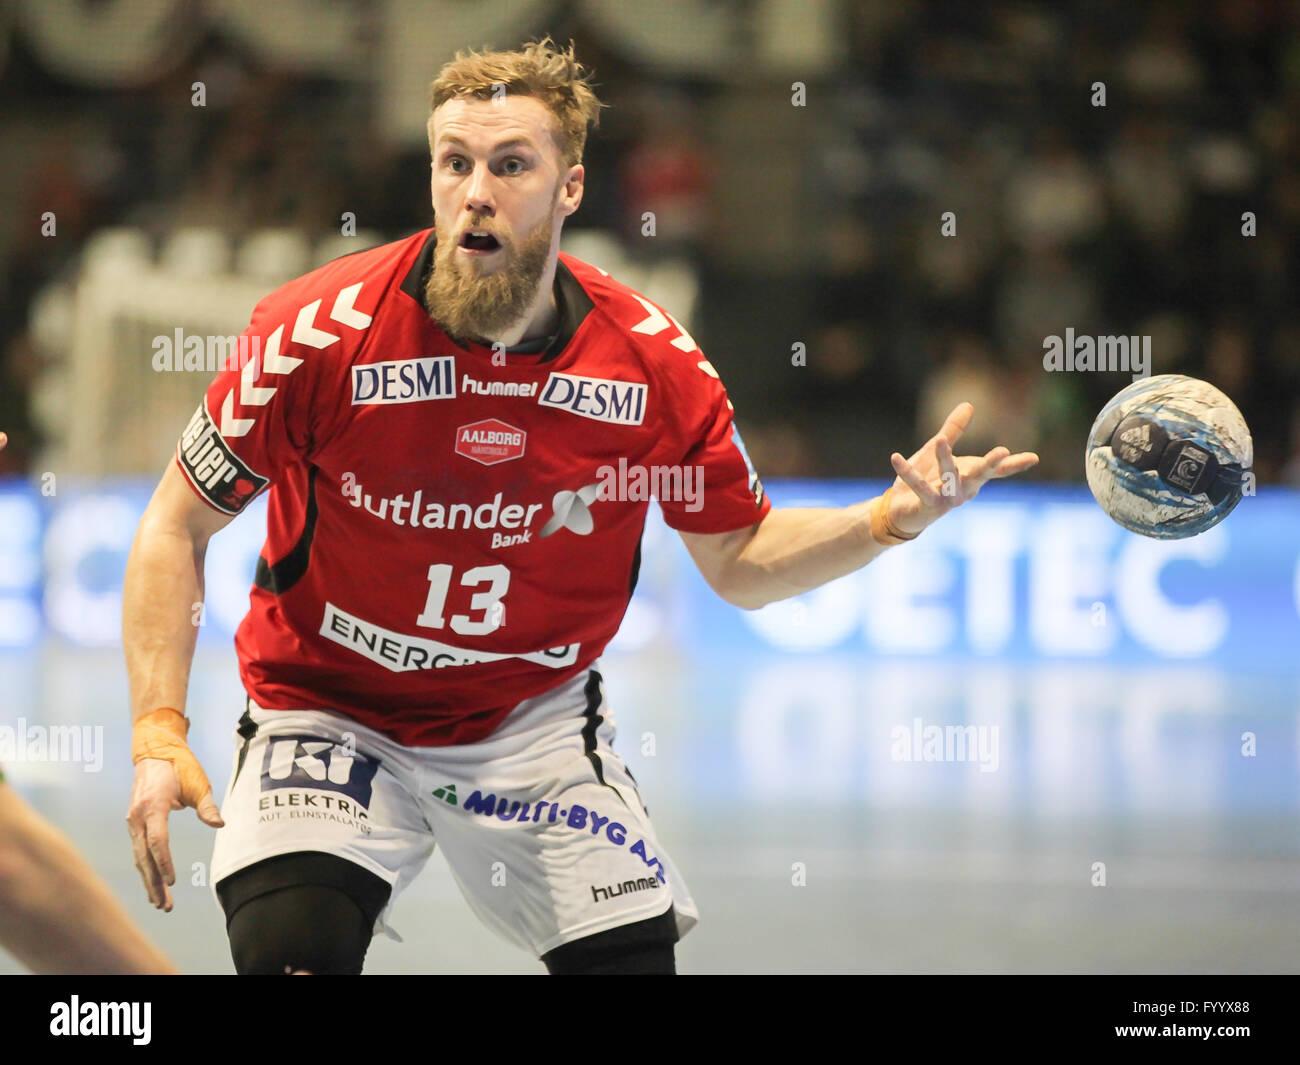 Chris Jörgensen (Aalborg Handbold) - Stock Image